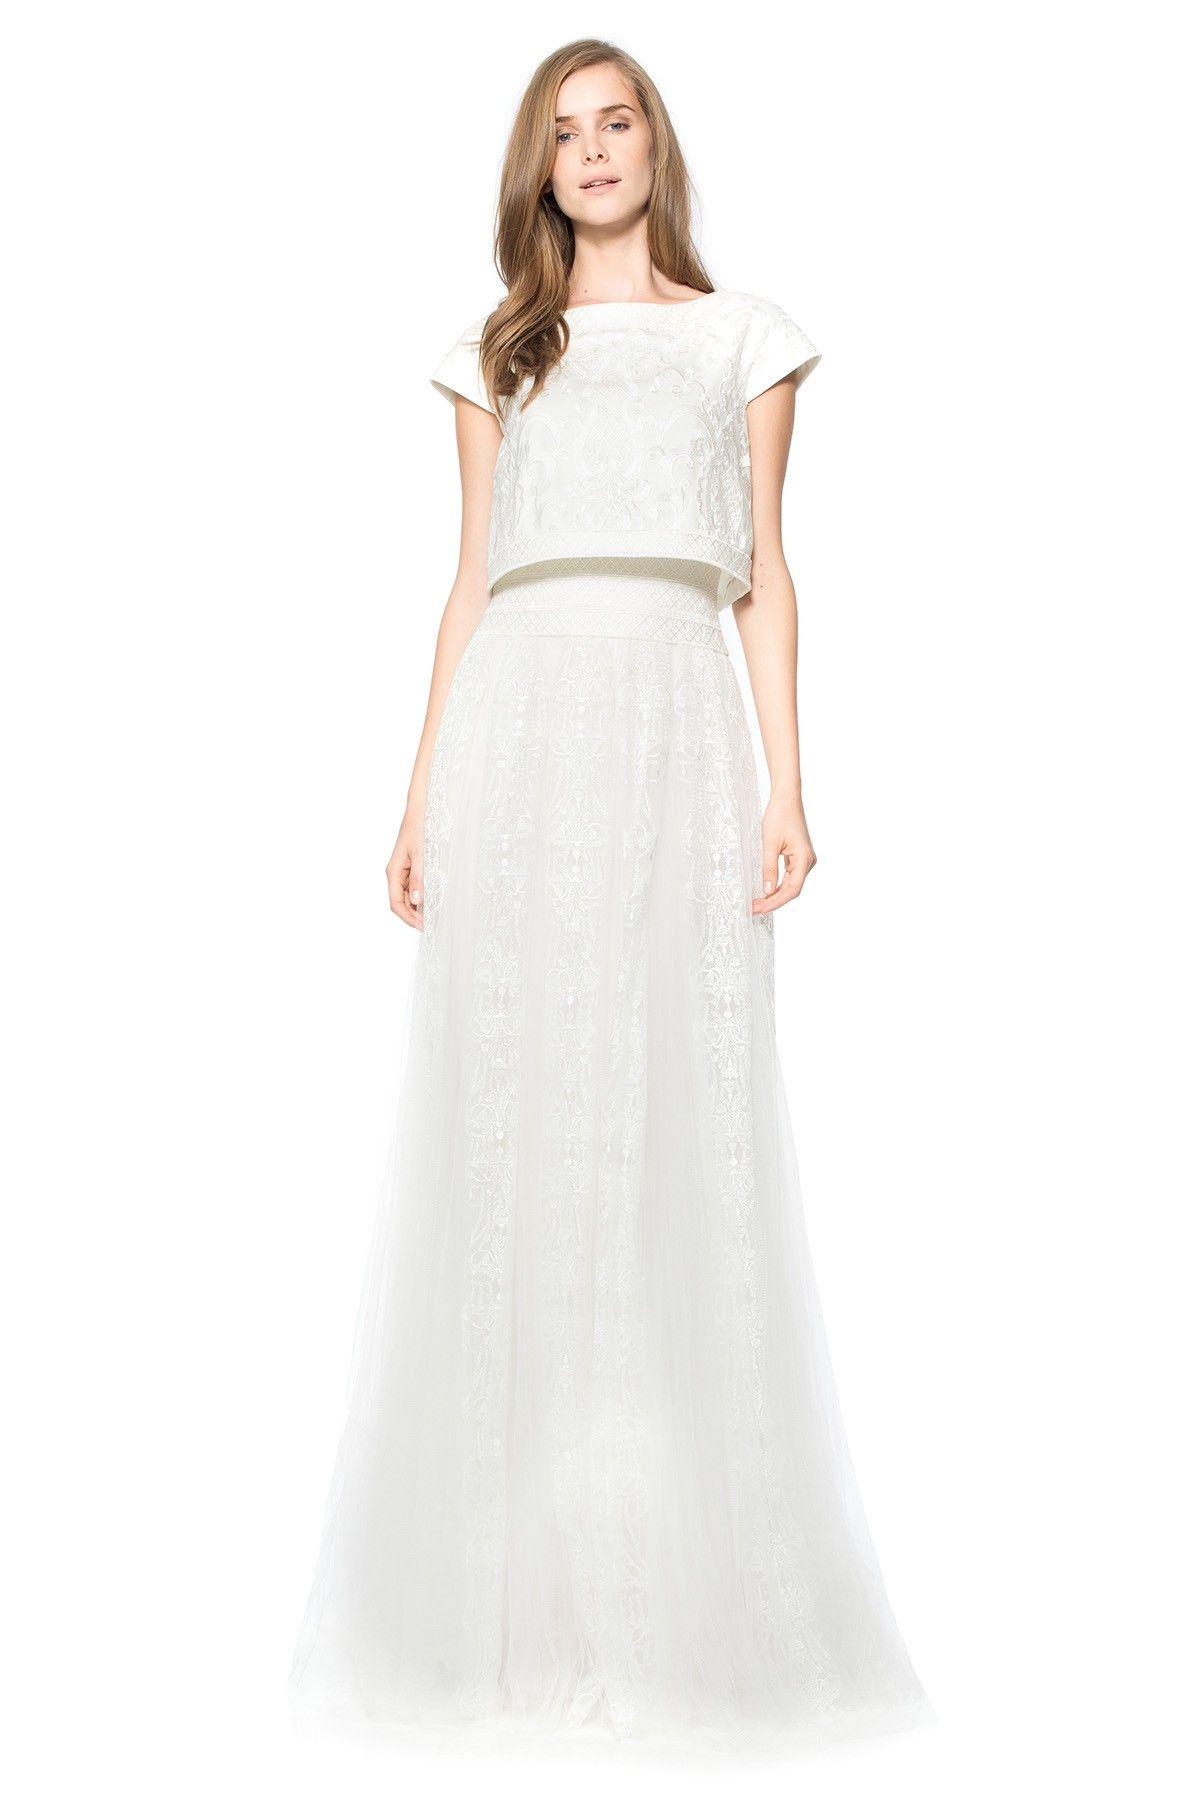 Tadashi shoji wedding guest dresses  Embroidered Tulle Crop Top Full Skirt Gown in Ivory  Tadashi Shoji